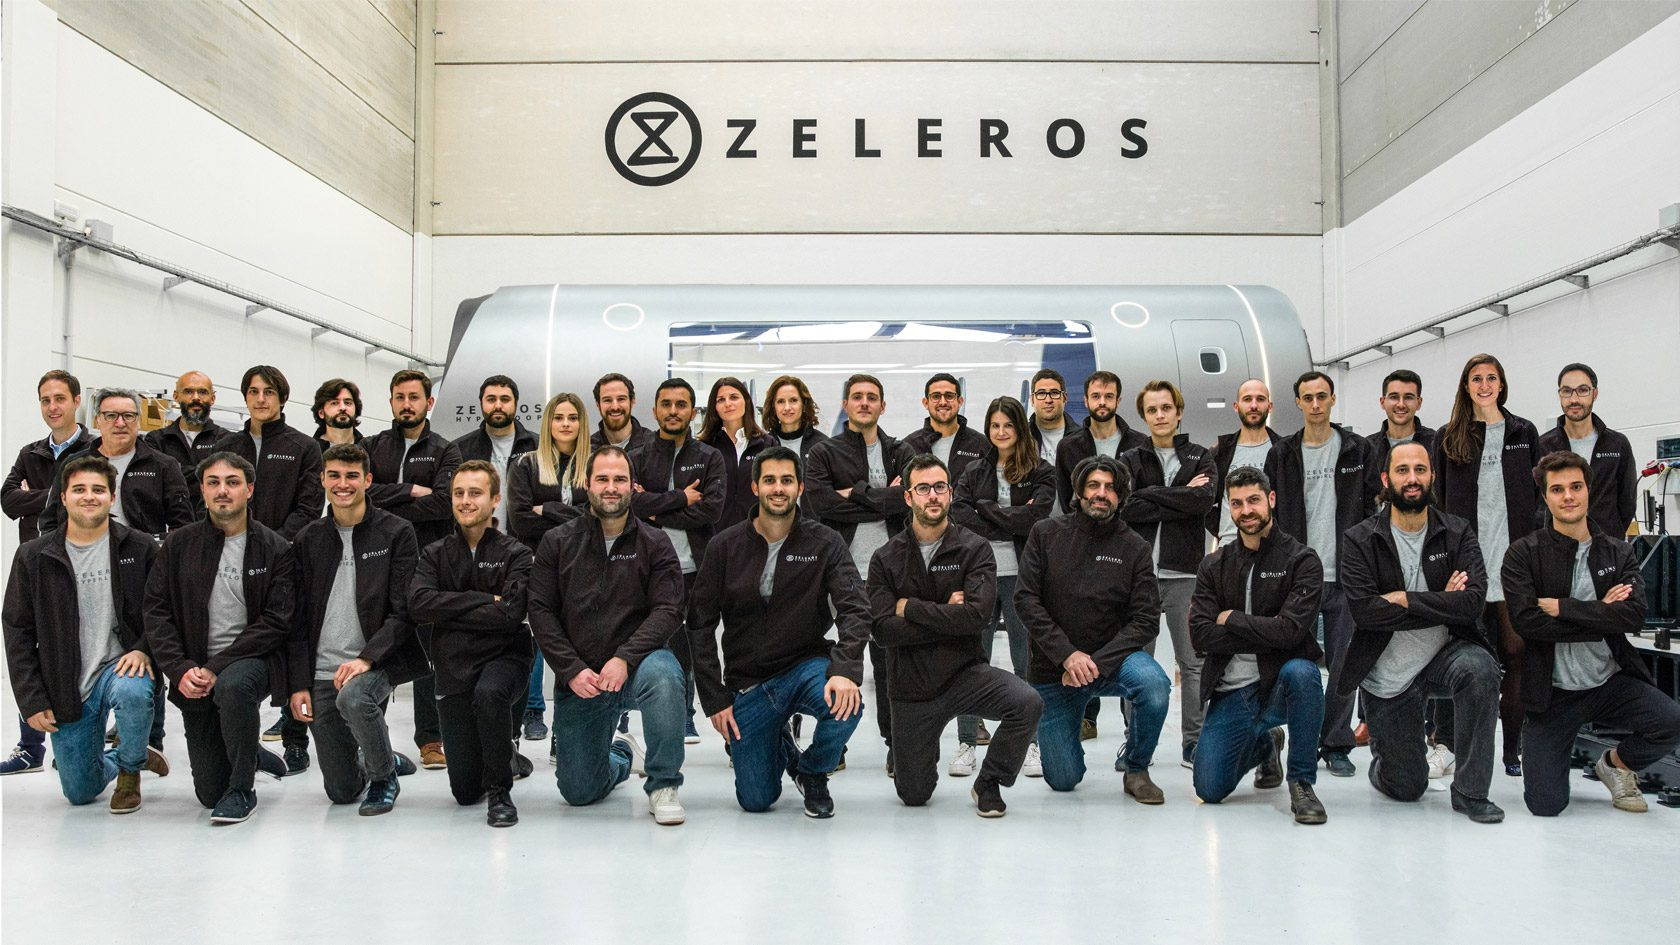 zeleros team image